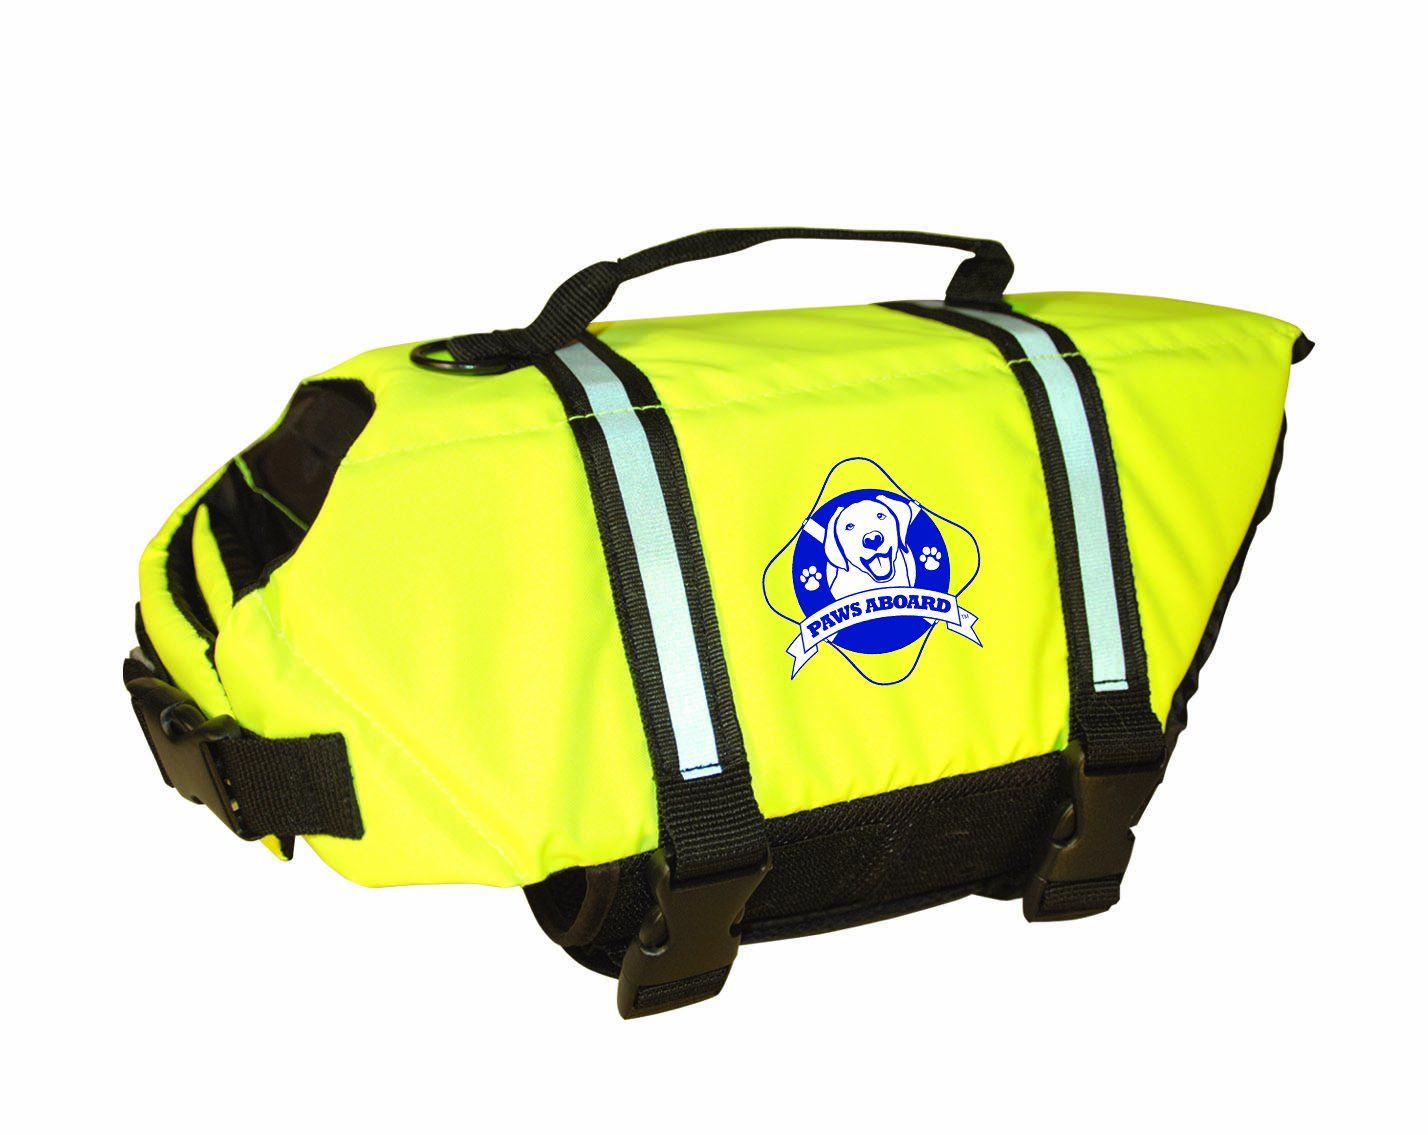 Paws Aboard Medium Designer Doggy Life Jacket, Neon Yellow